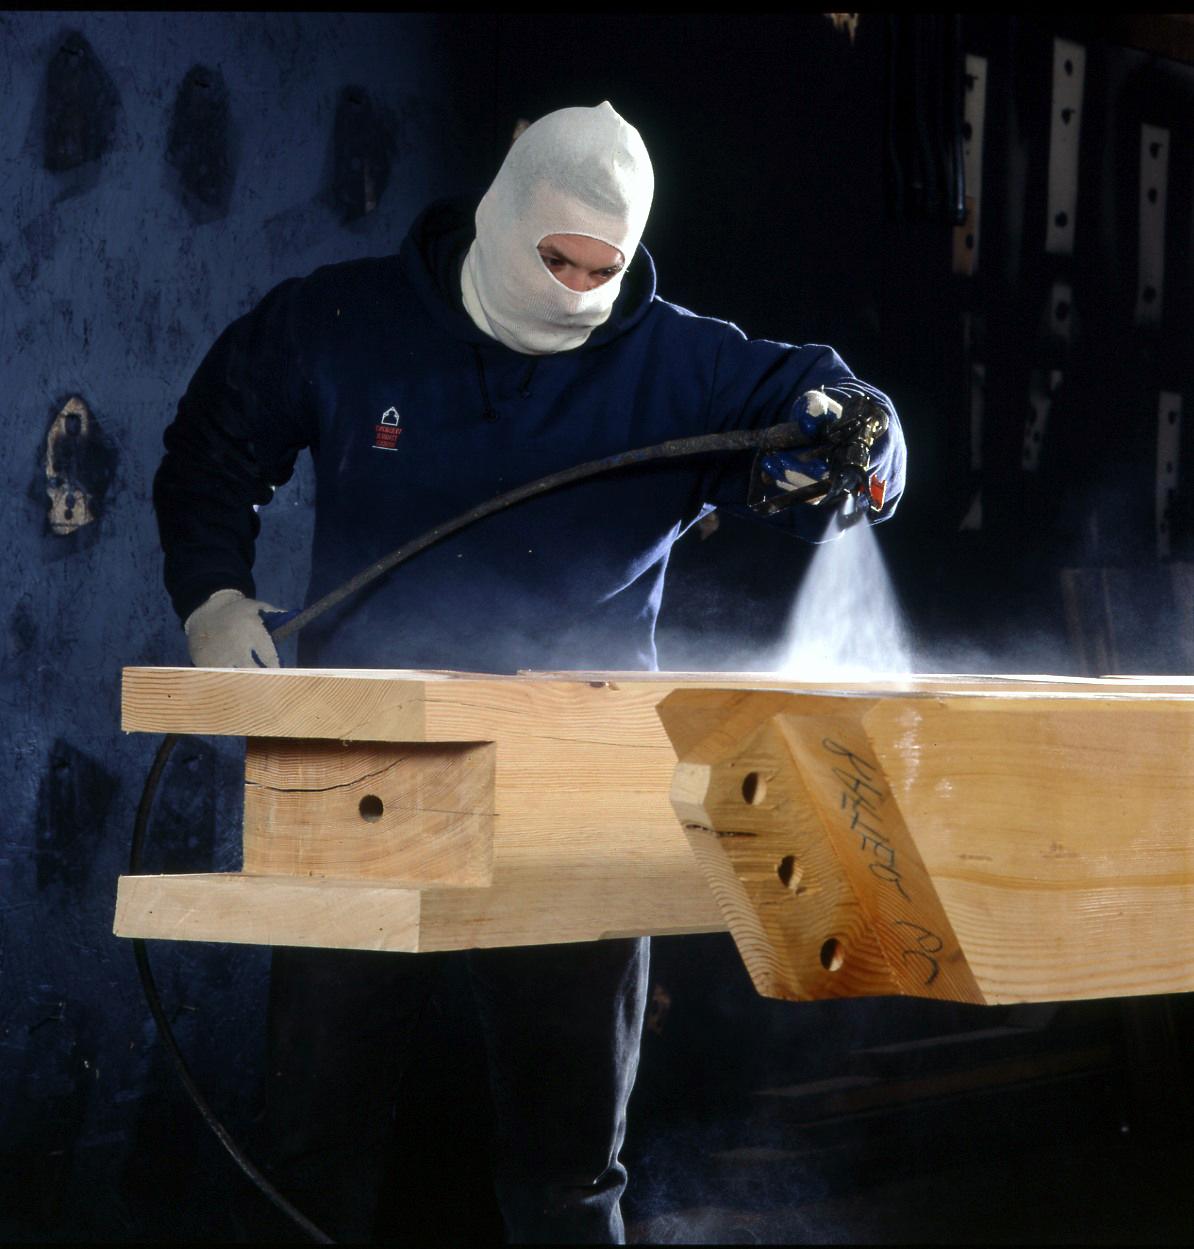 steel chair manufacturing process design logo wood finishing wikipedia